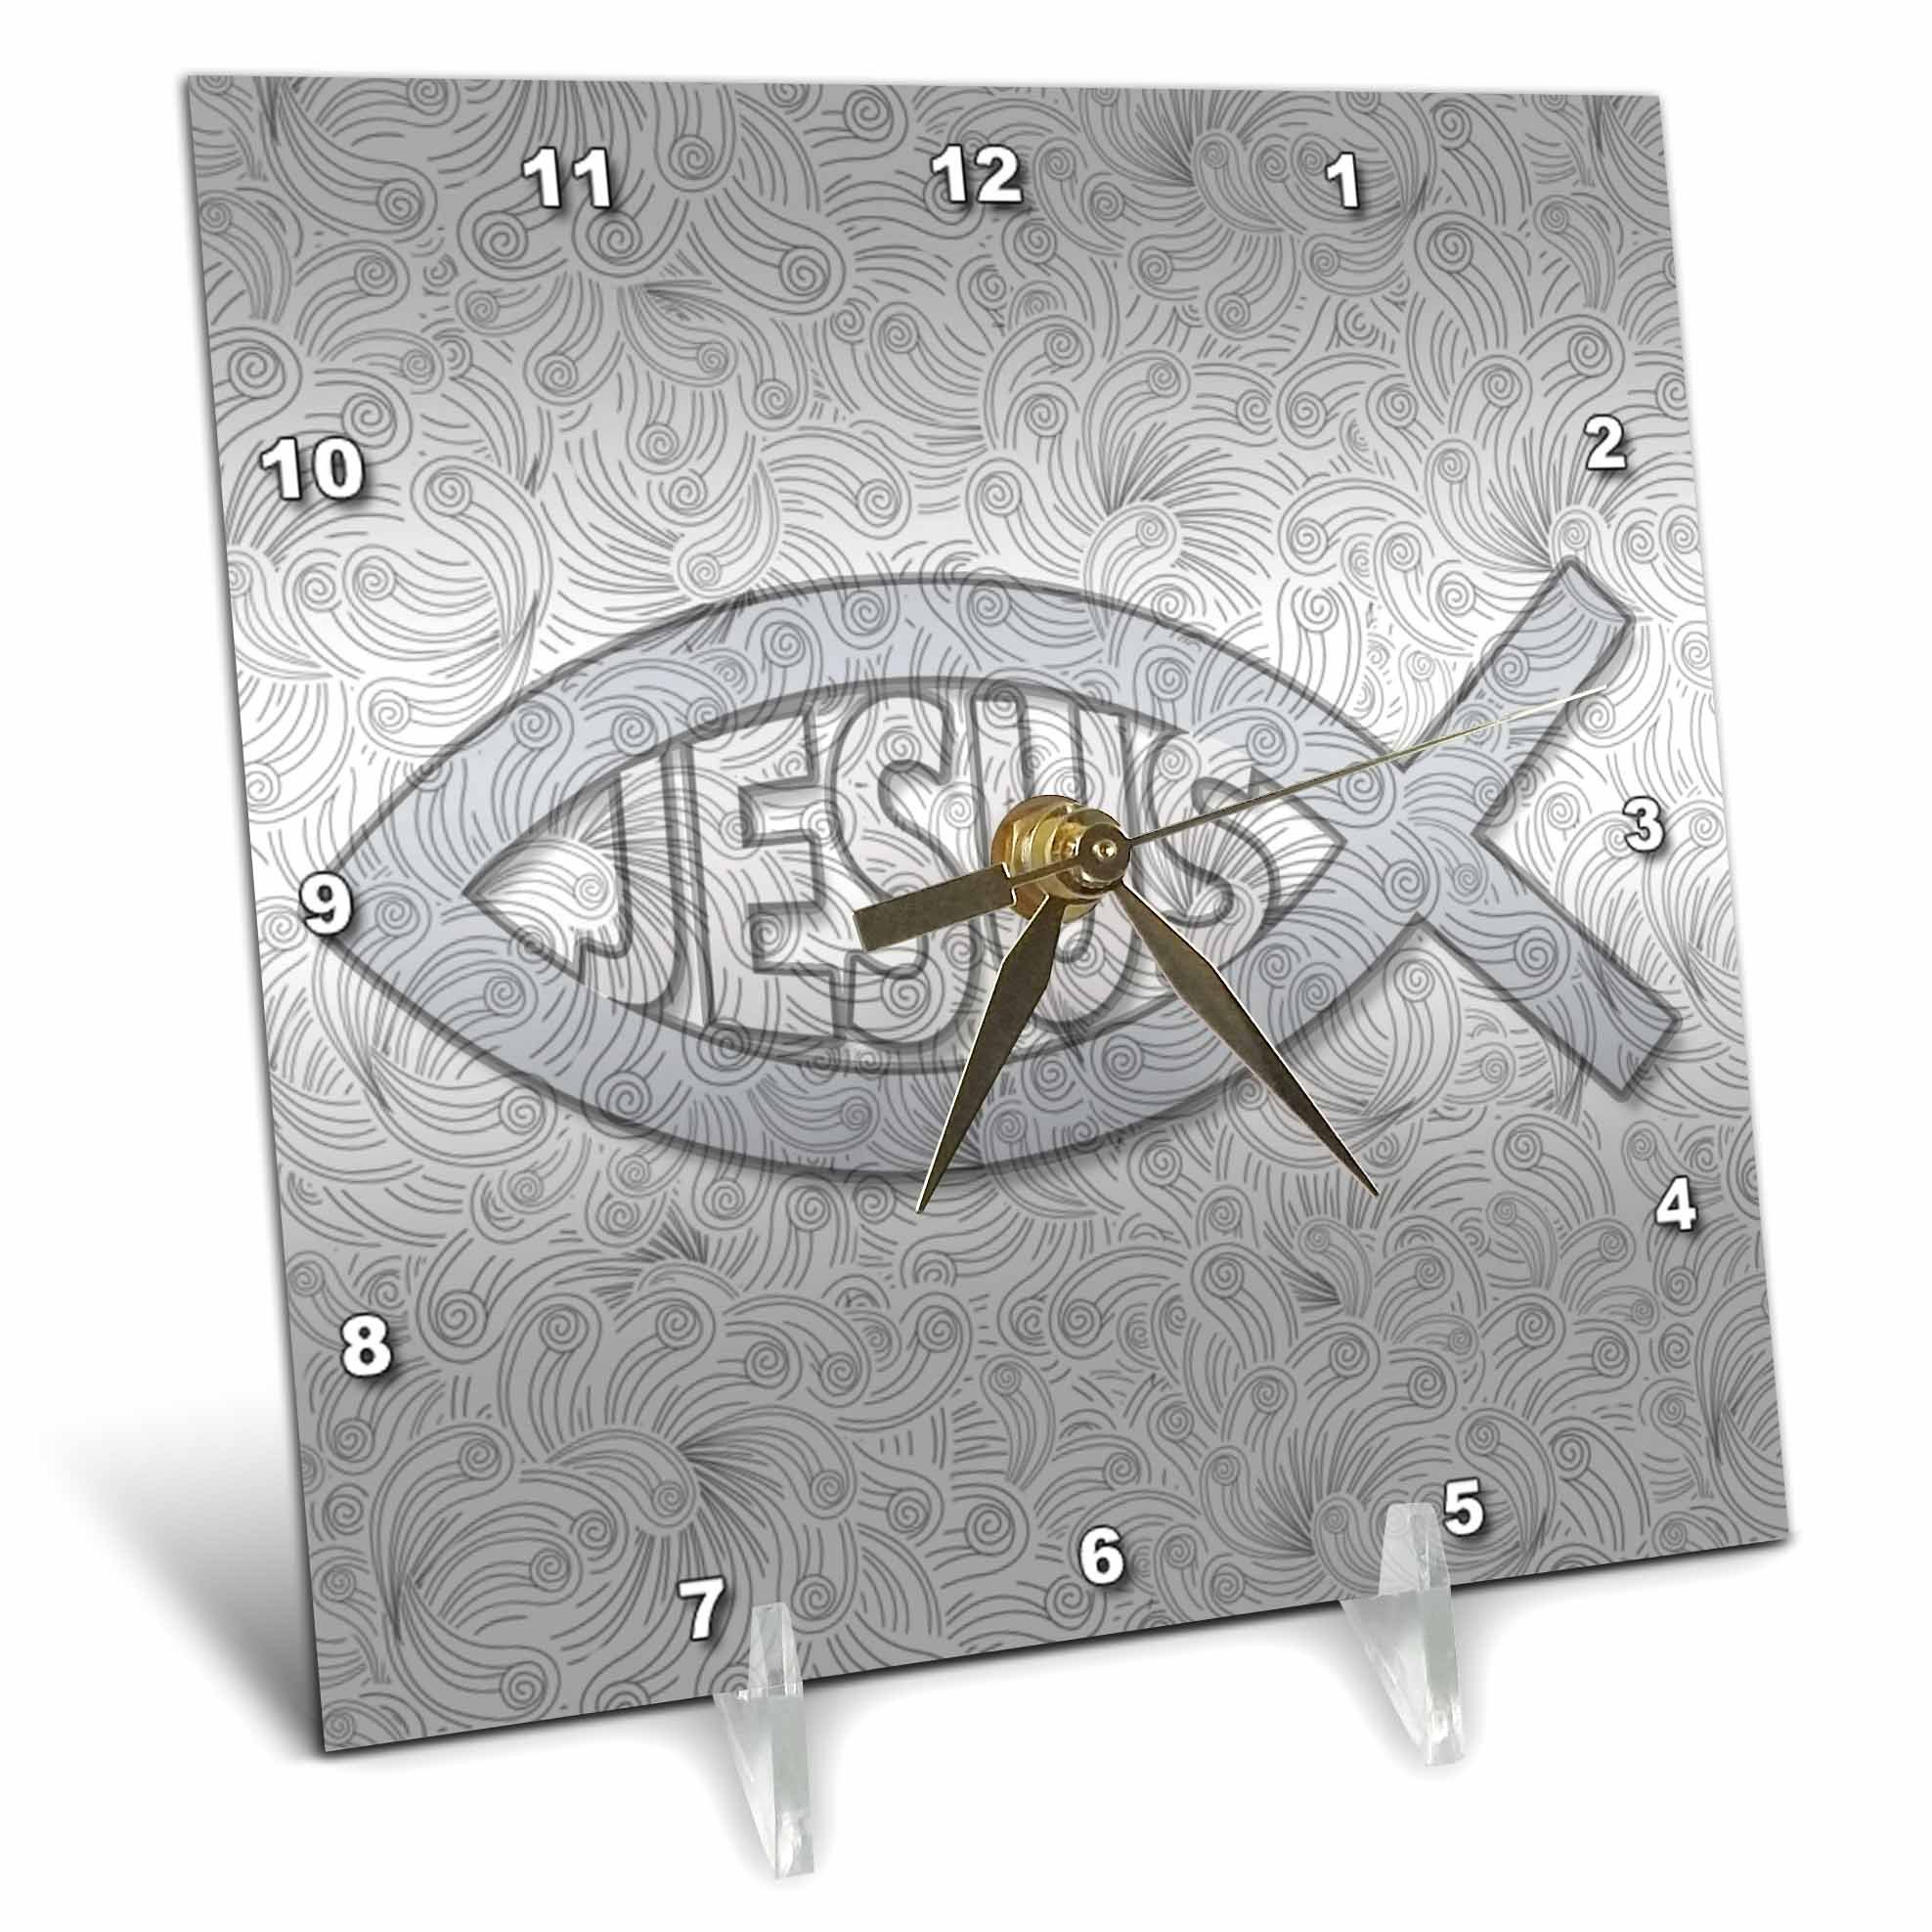 3dRose Christian Fish Symbol Jesus Hues Religious Faith Desk Clock, 6x6, Silver